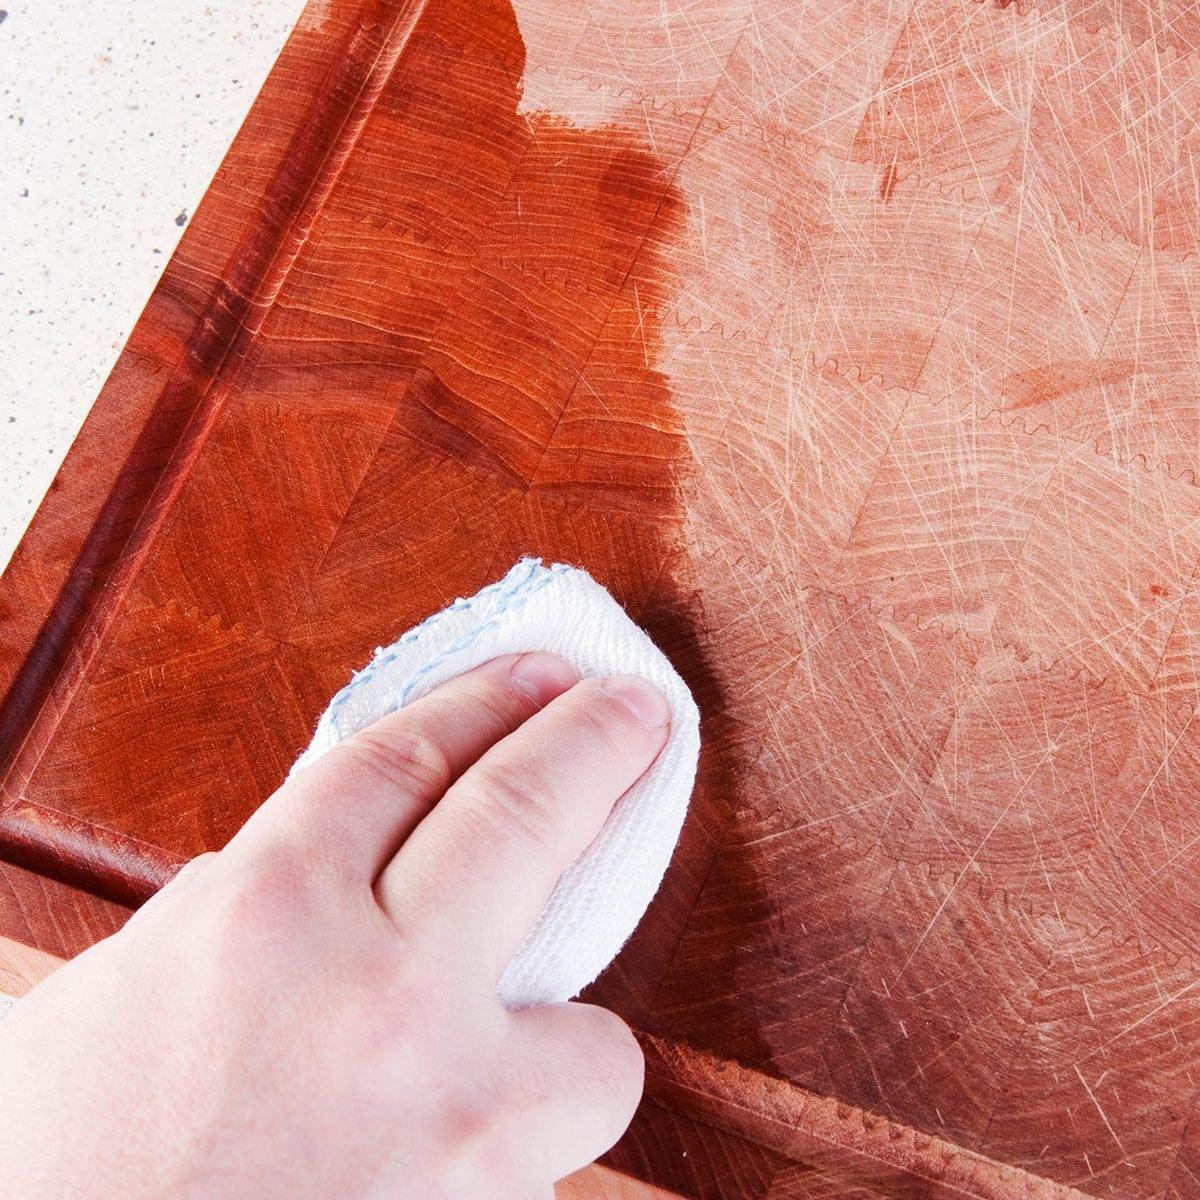 cutting board hacks: oiling the chopping board